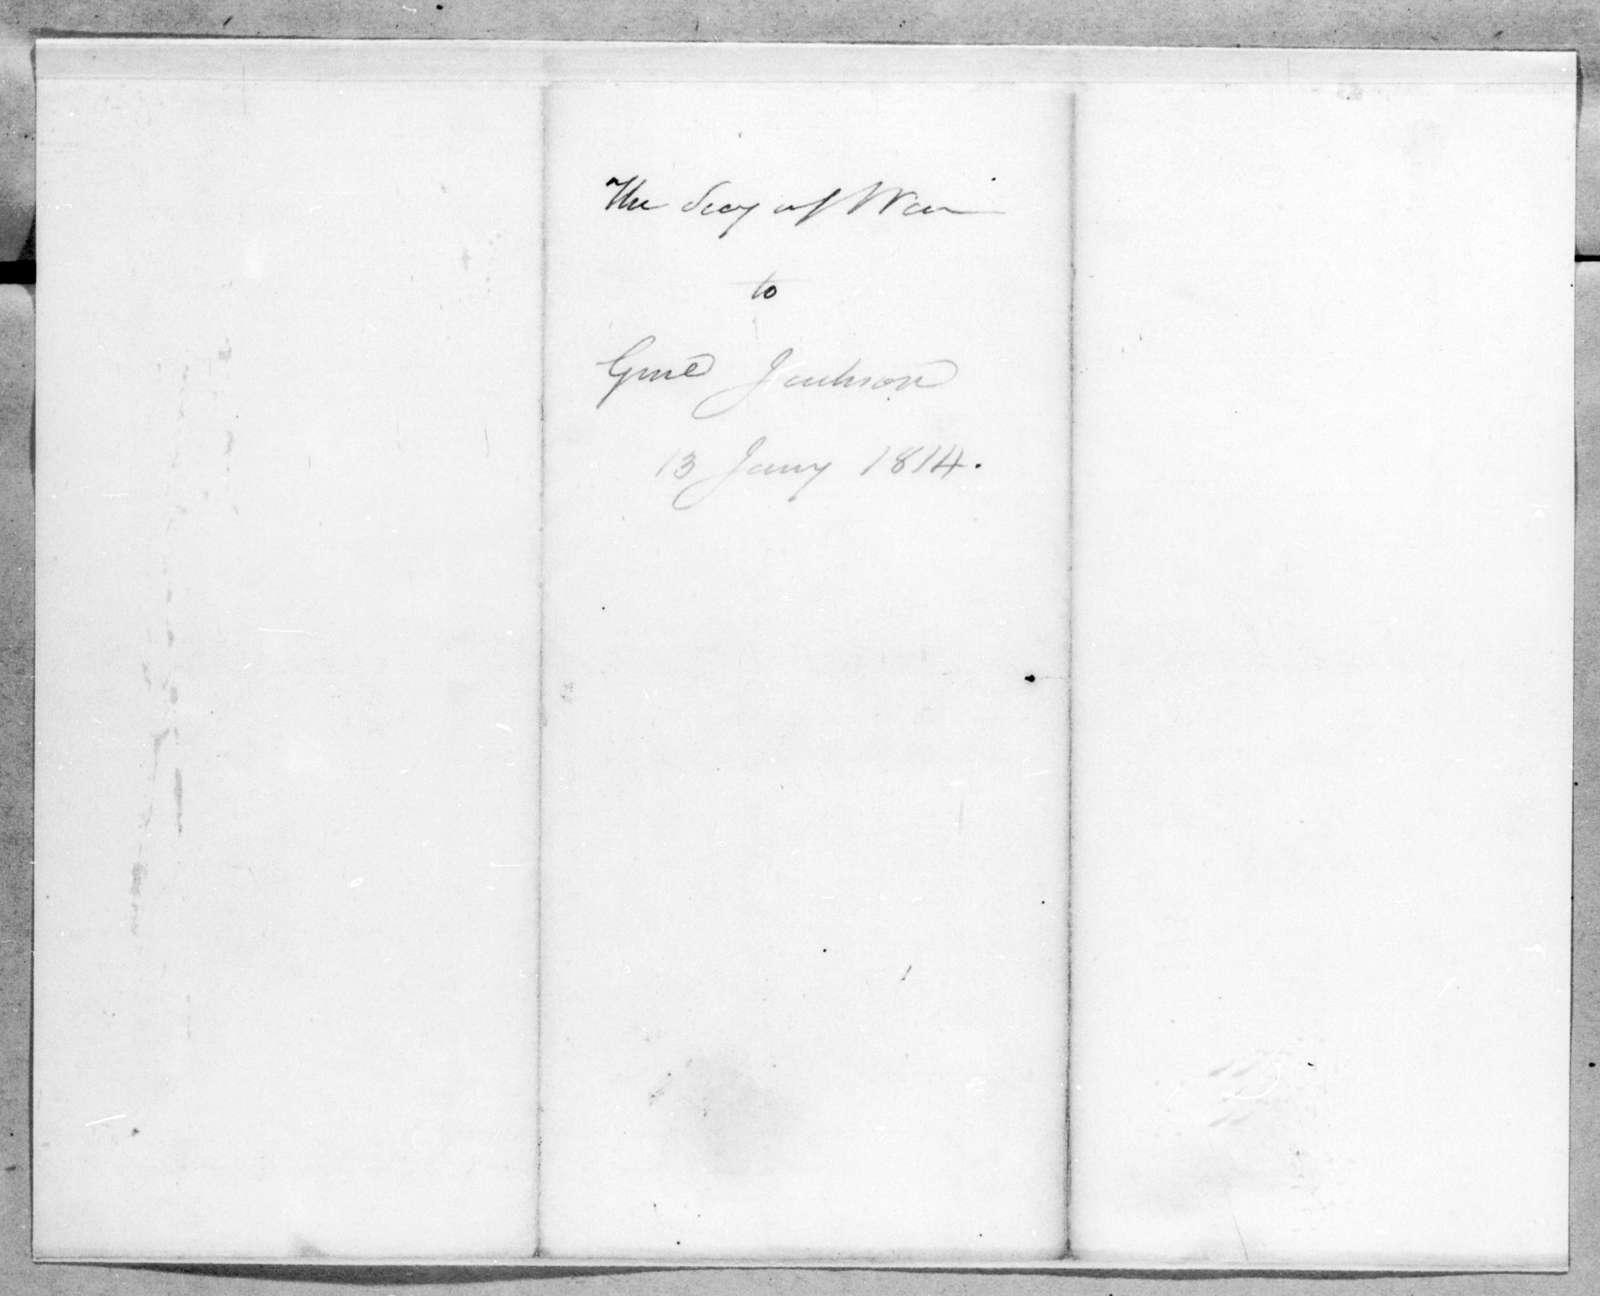 John Armstrong to Andrew Jackson, January 13, 1814